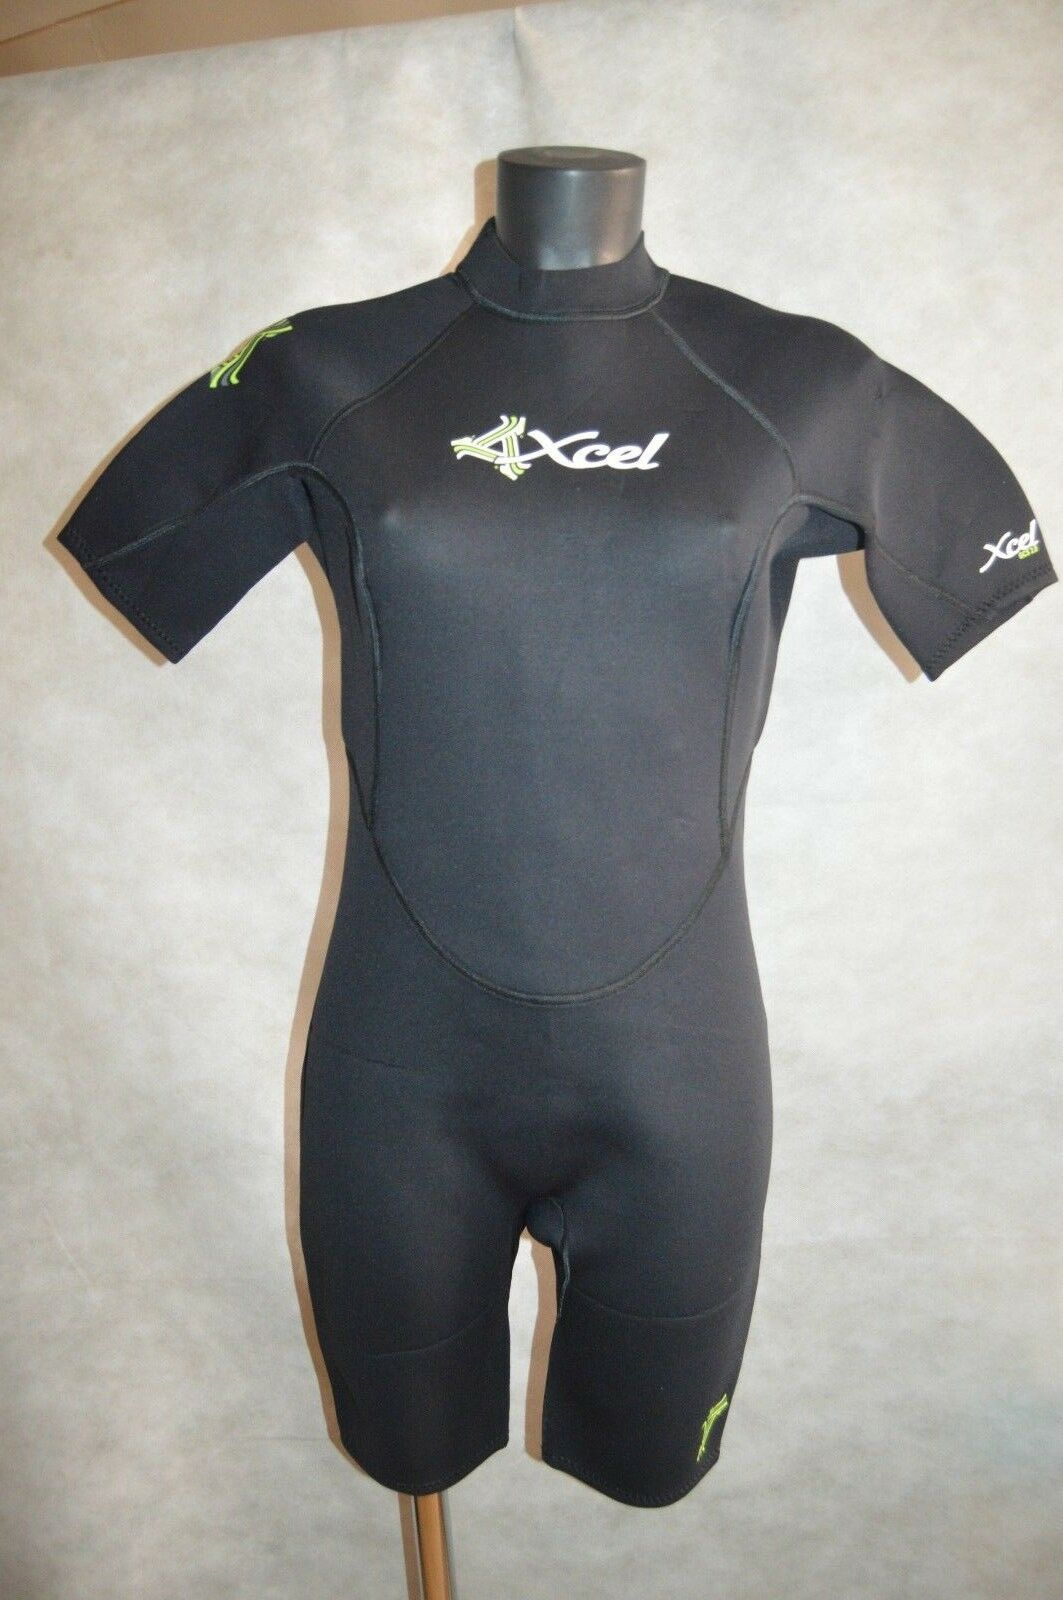 Wetsuit Shorty Neoprene 2.0 Xcel XL 12 Wetsuit Surf Windsurf New Shorts